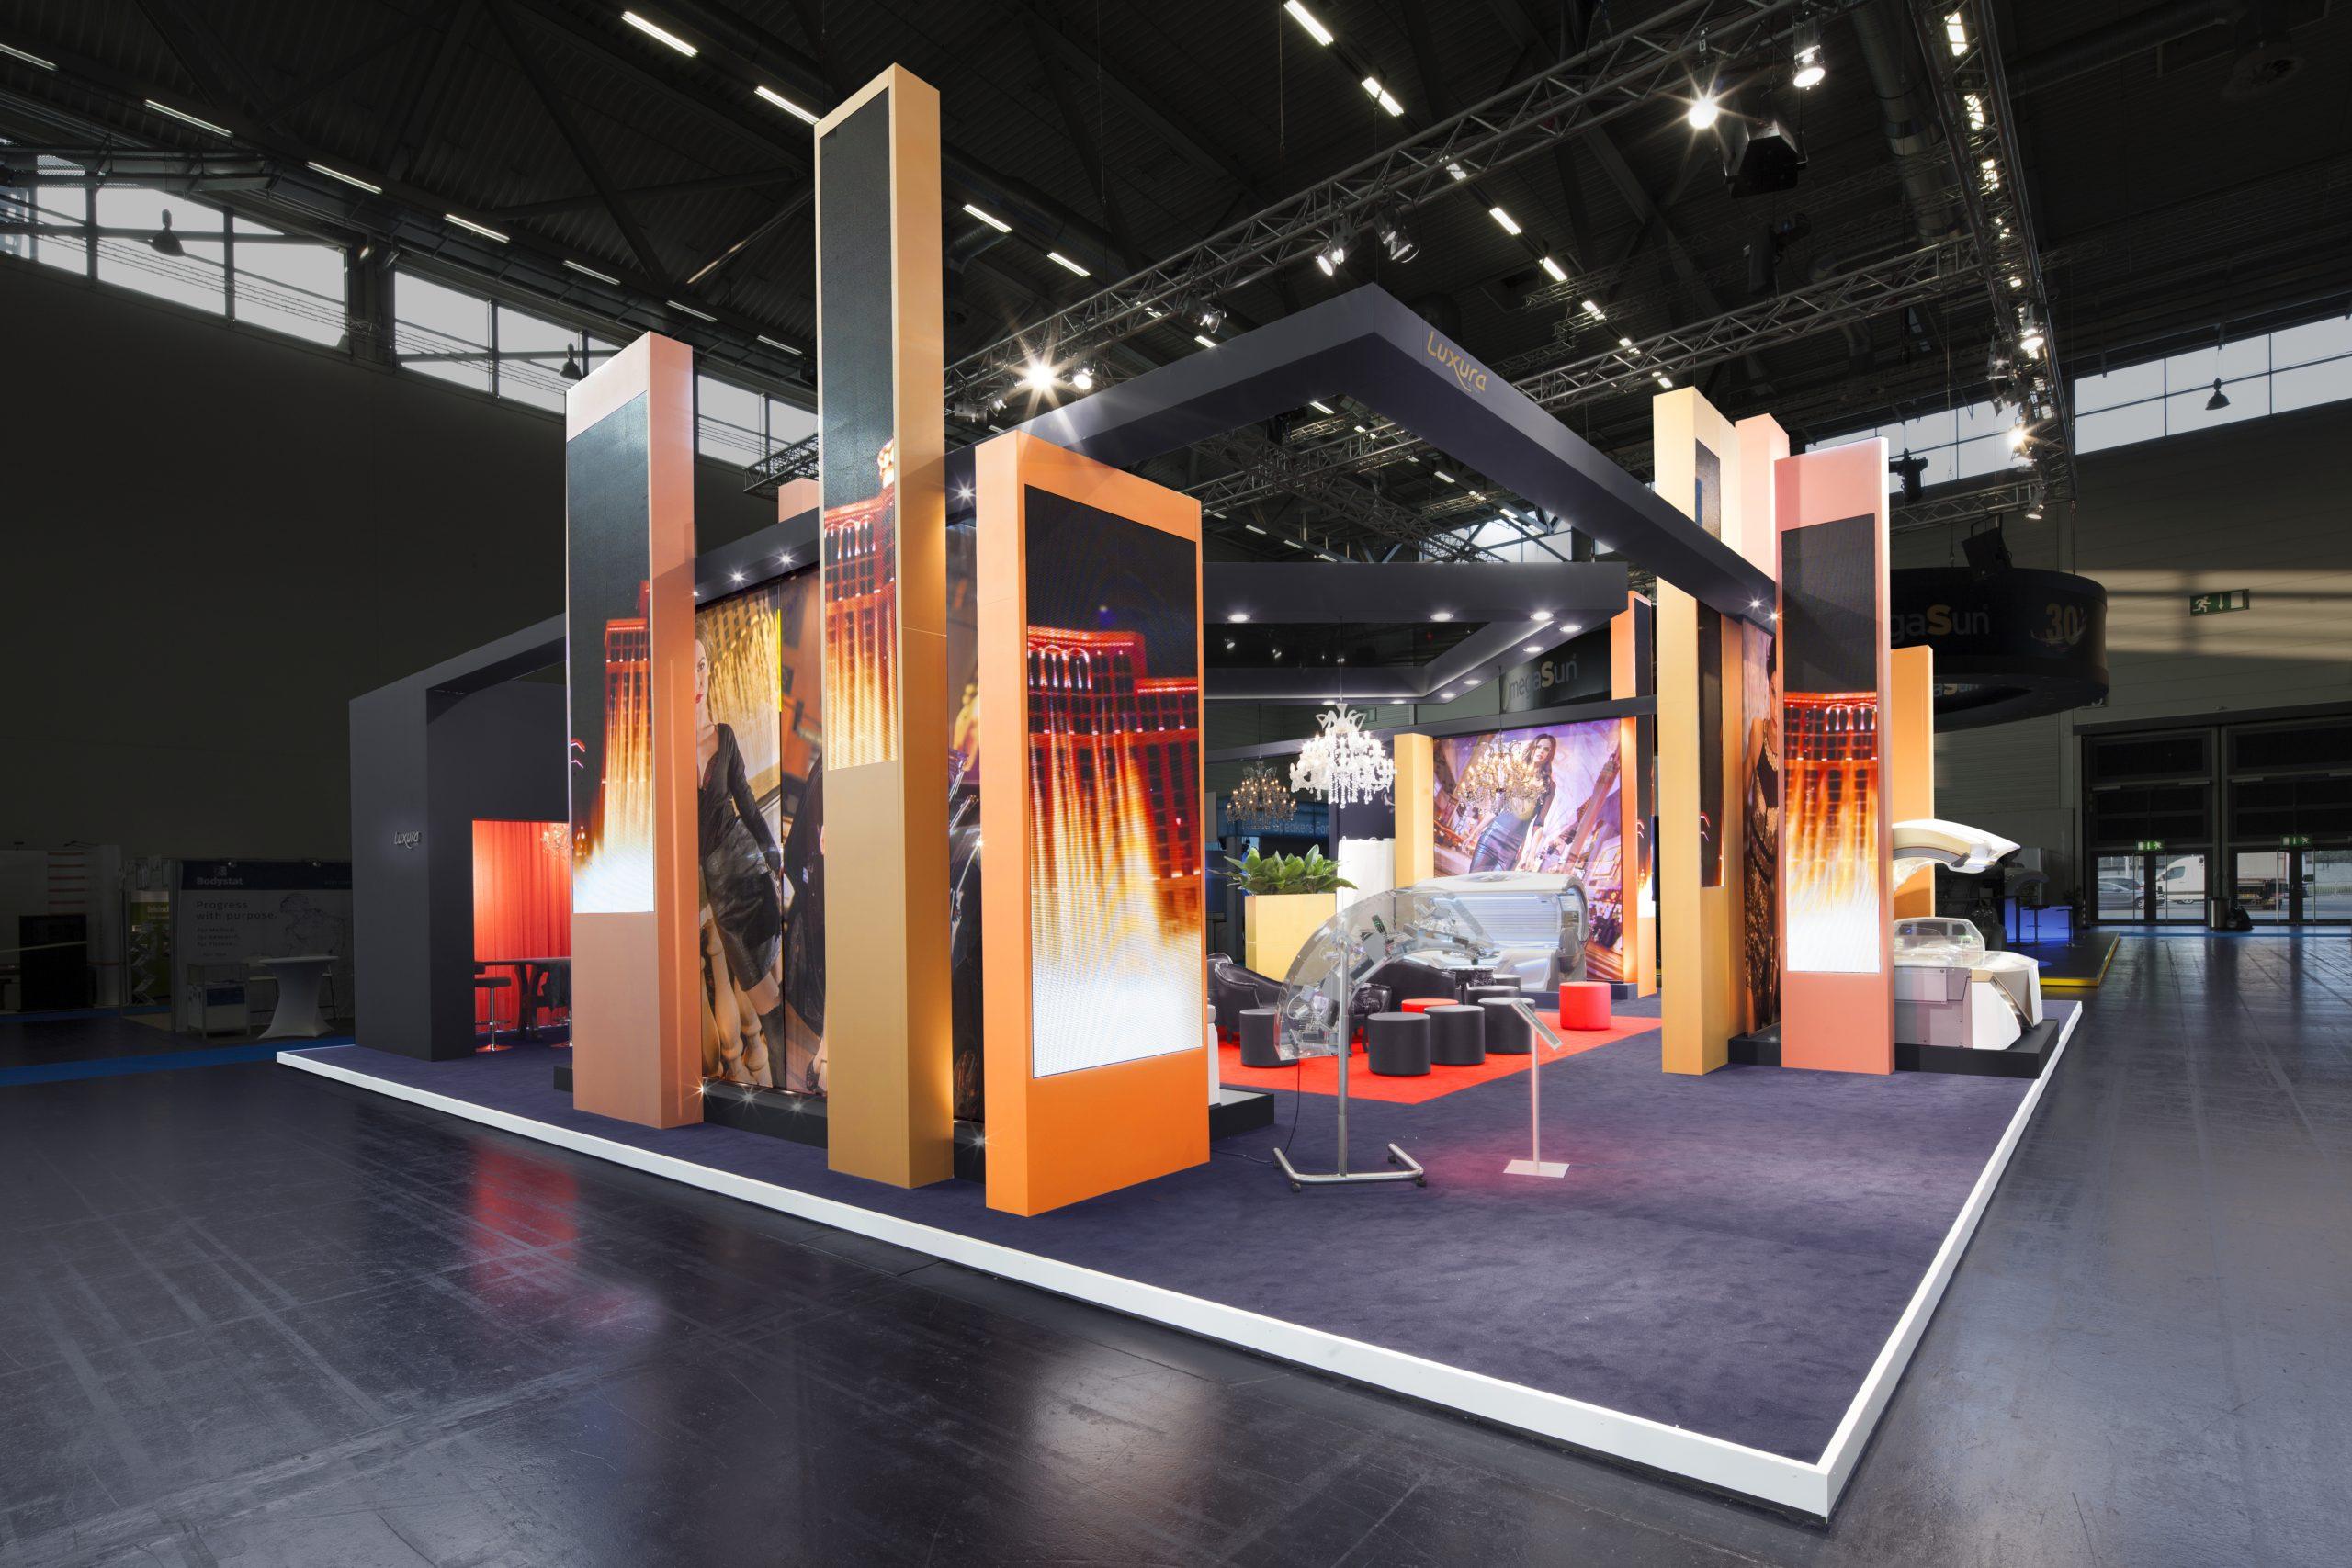 CAS Standbouw - Luxura - FIBO 2017 - Keulen - Standbouwfotografie #9255BPUNT AFSNIJDEN !!